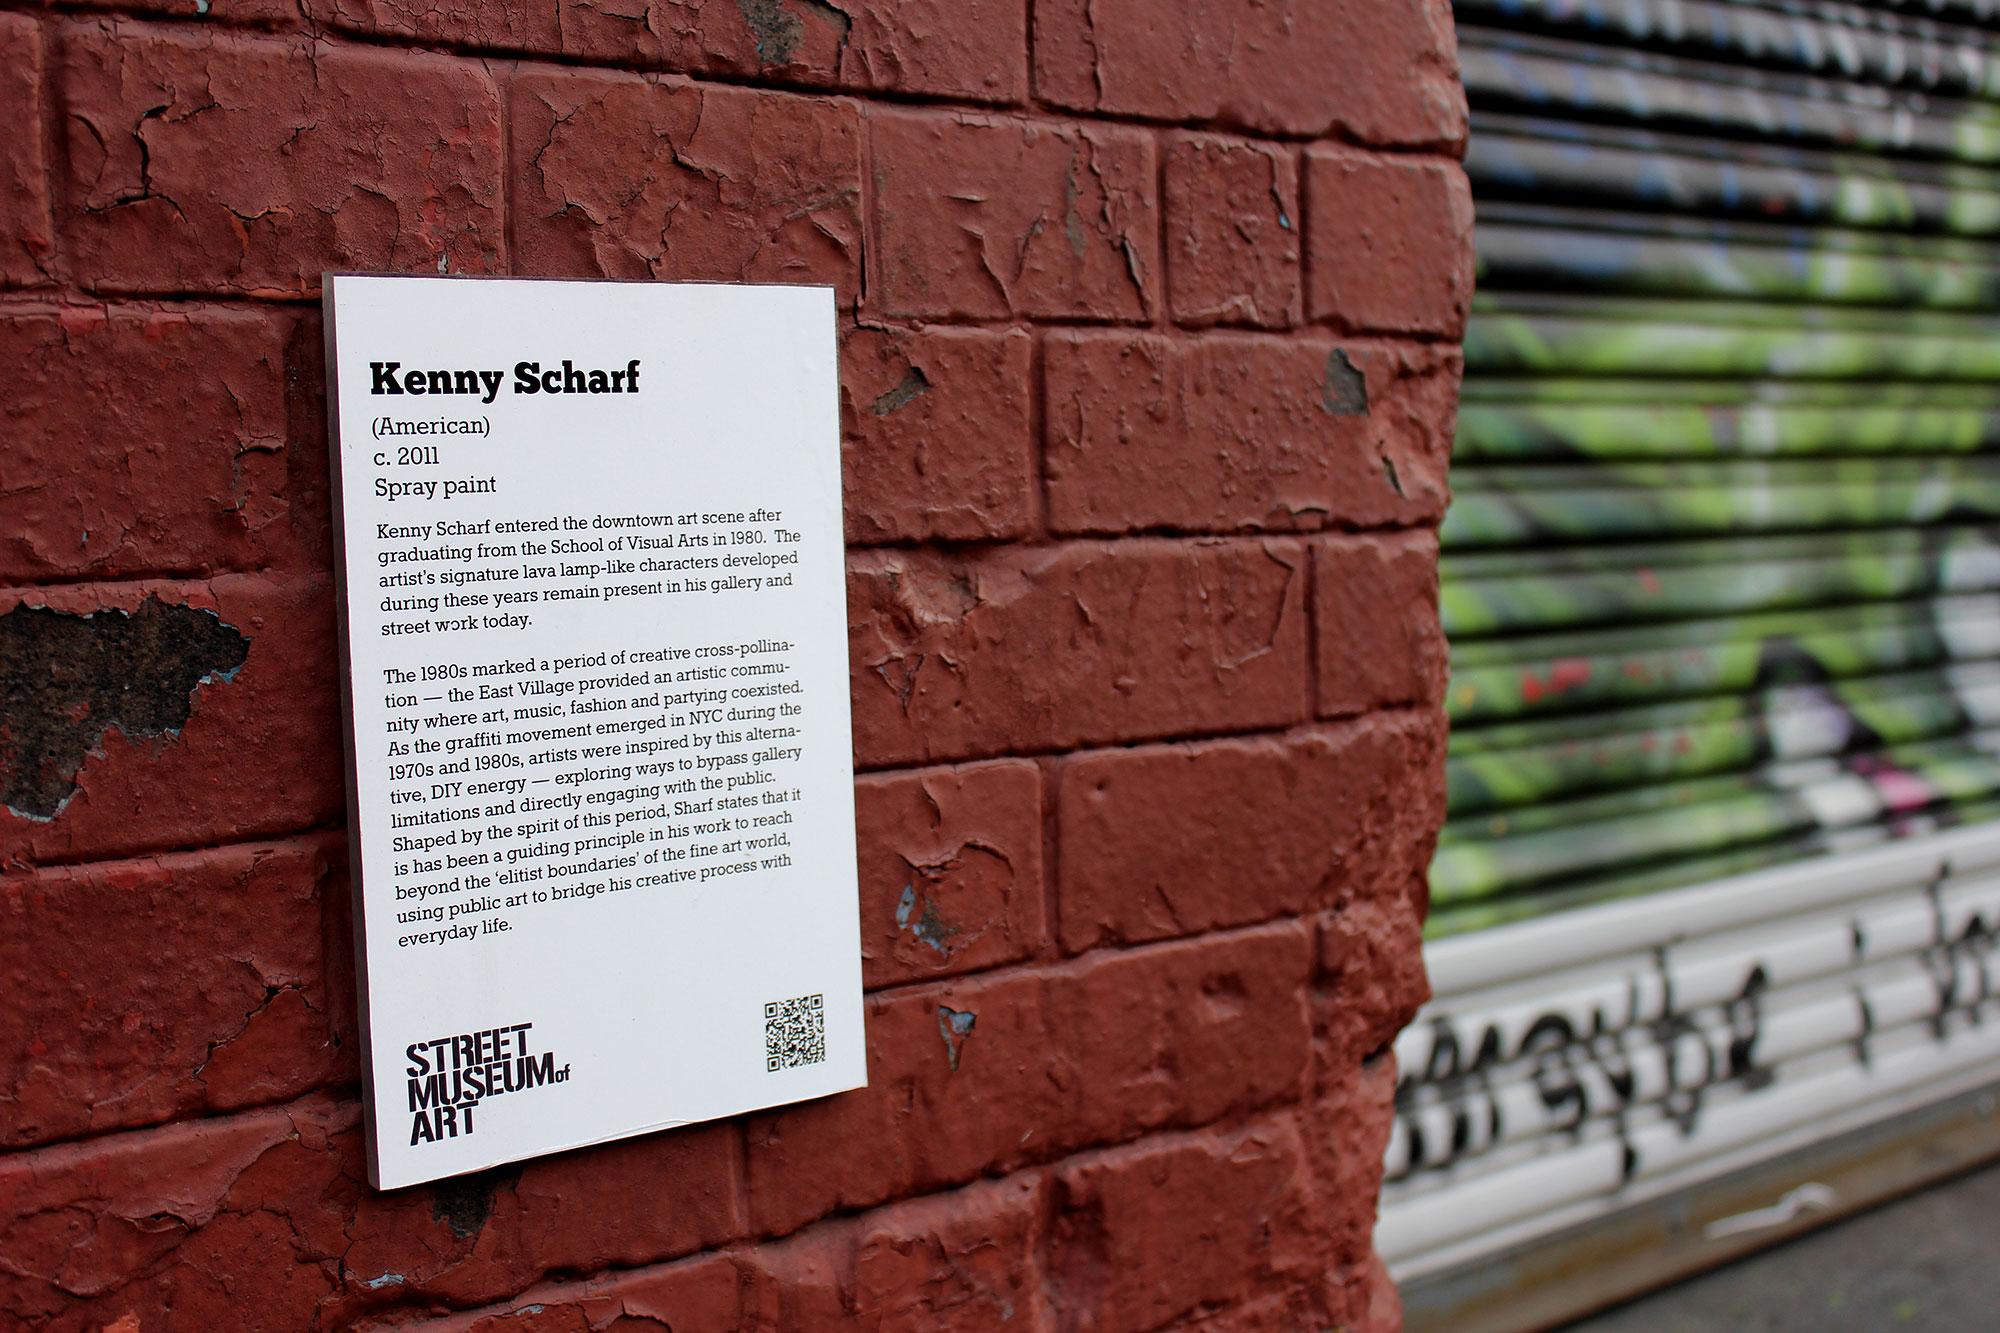 IMG_3296_KennyScharf_Chelsea_2013_LABEL-WEB.jpg